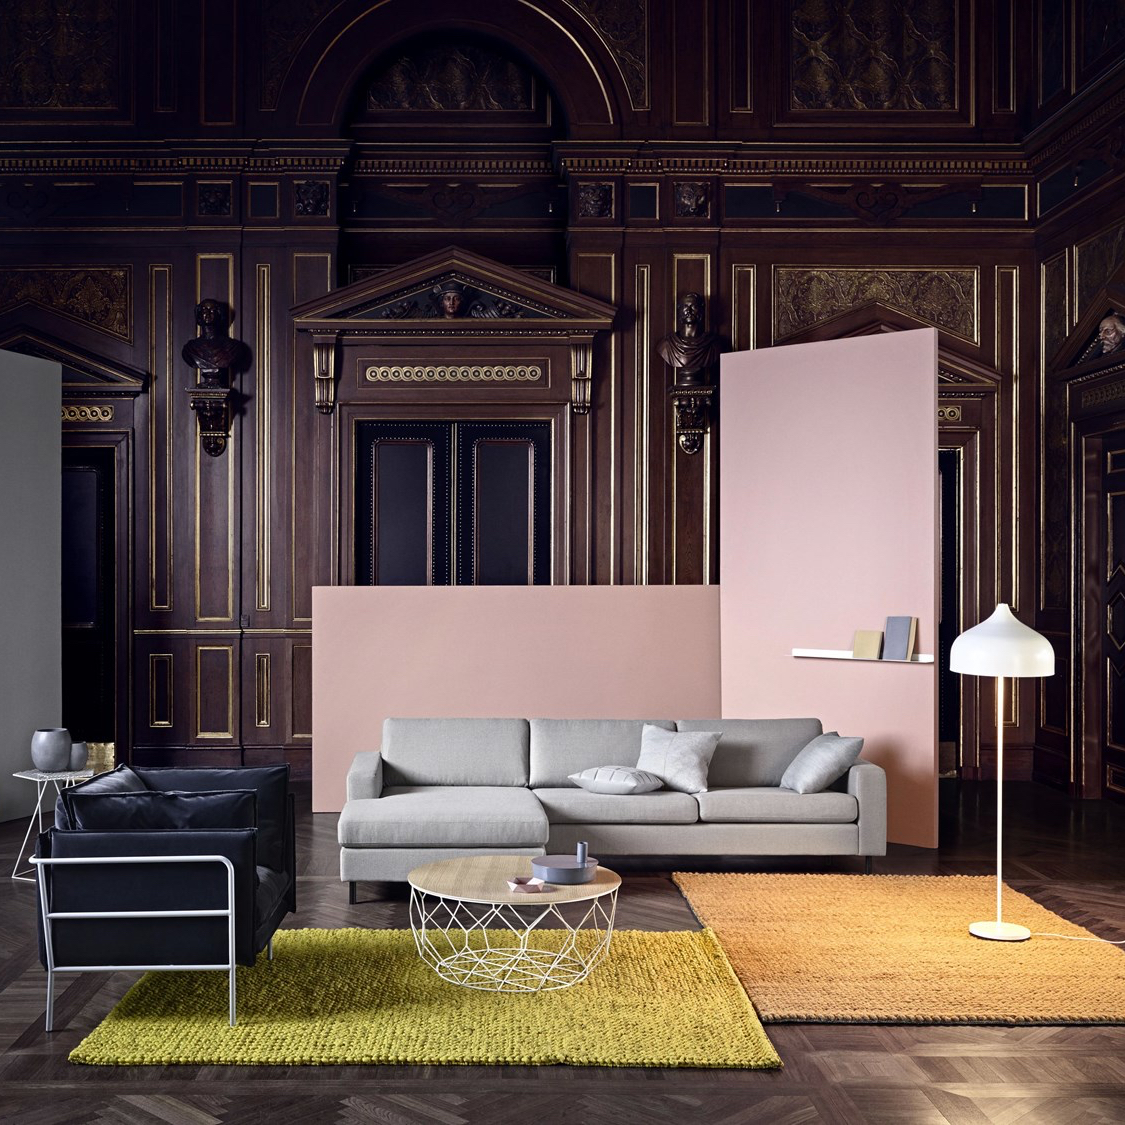 The Scandinavia corner sofa